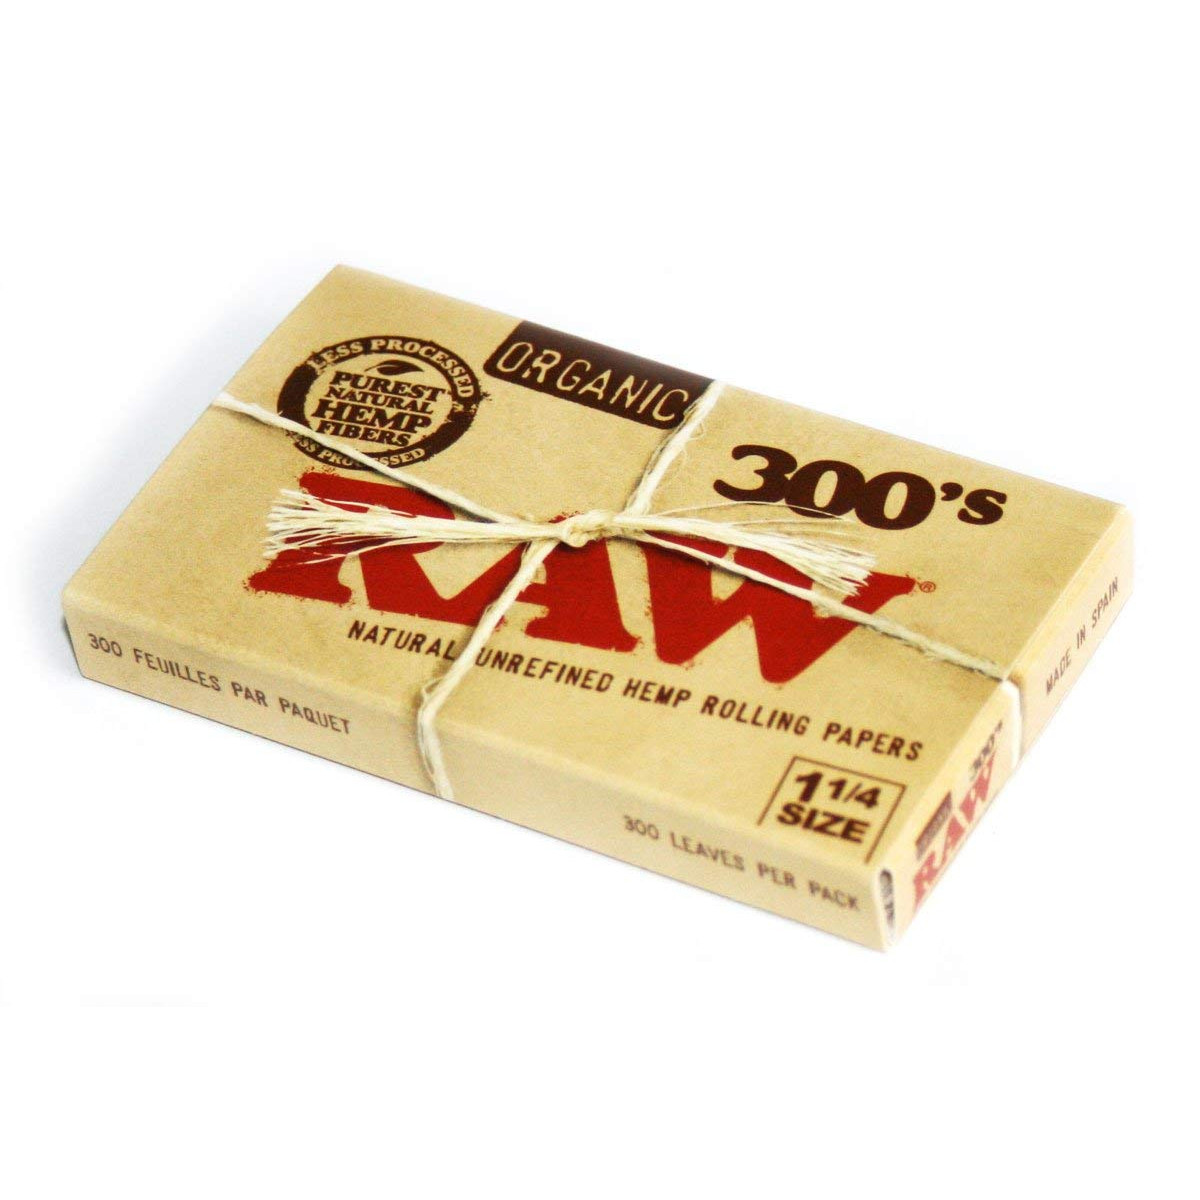 RAW 300'S 1¼ SM